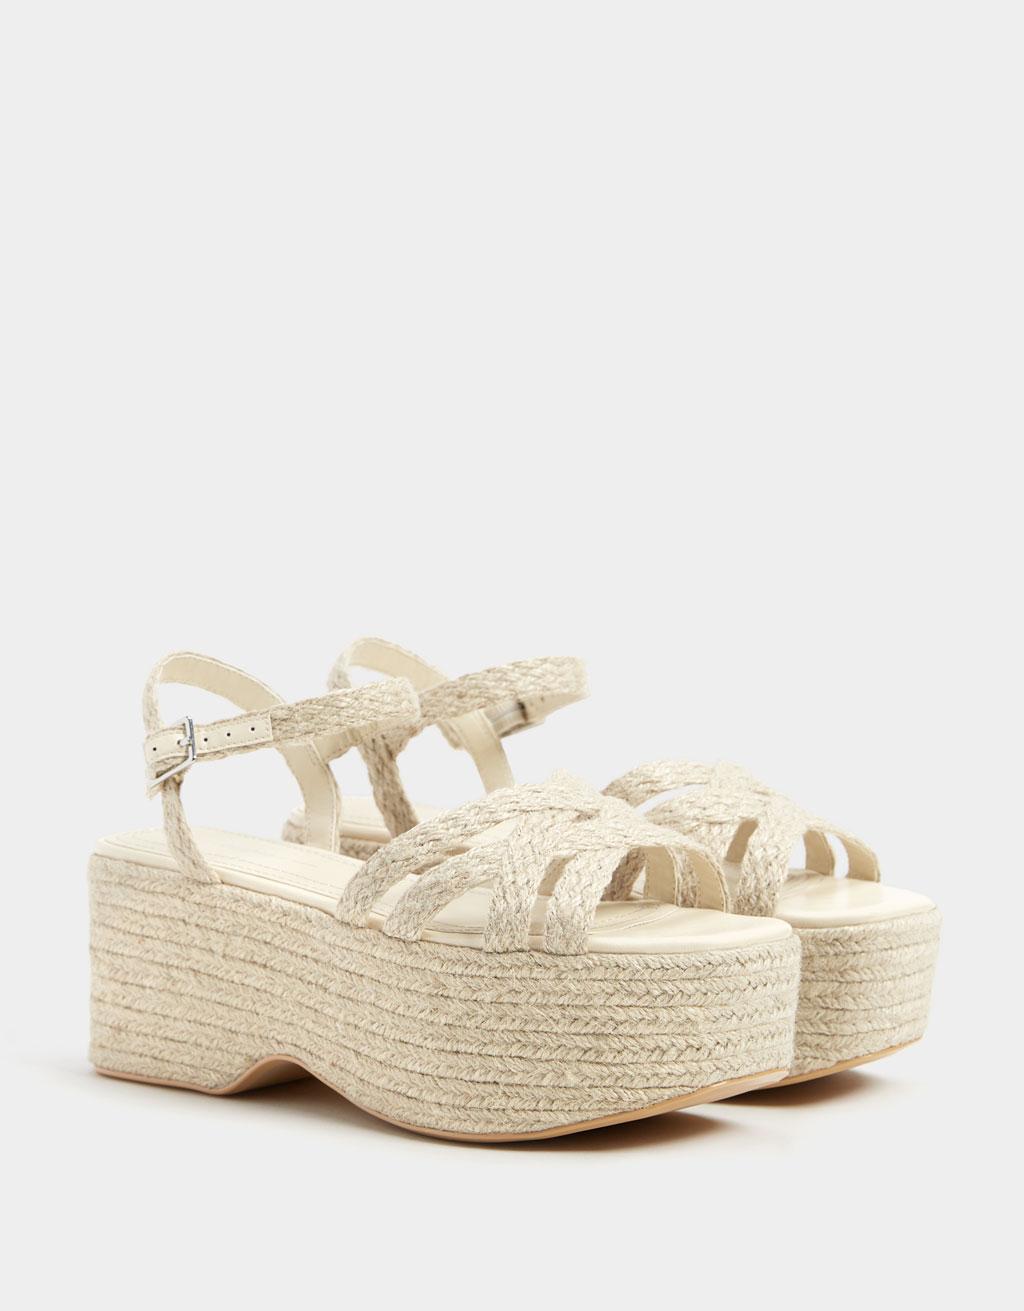 Sandale s platformom od jute